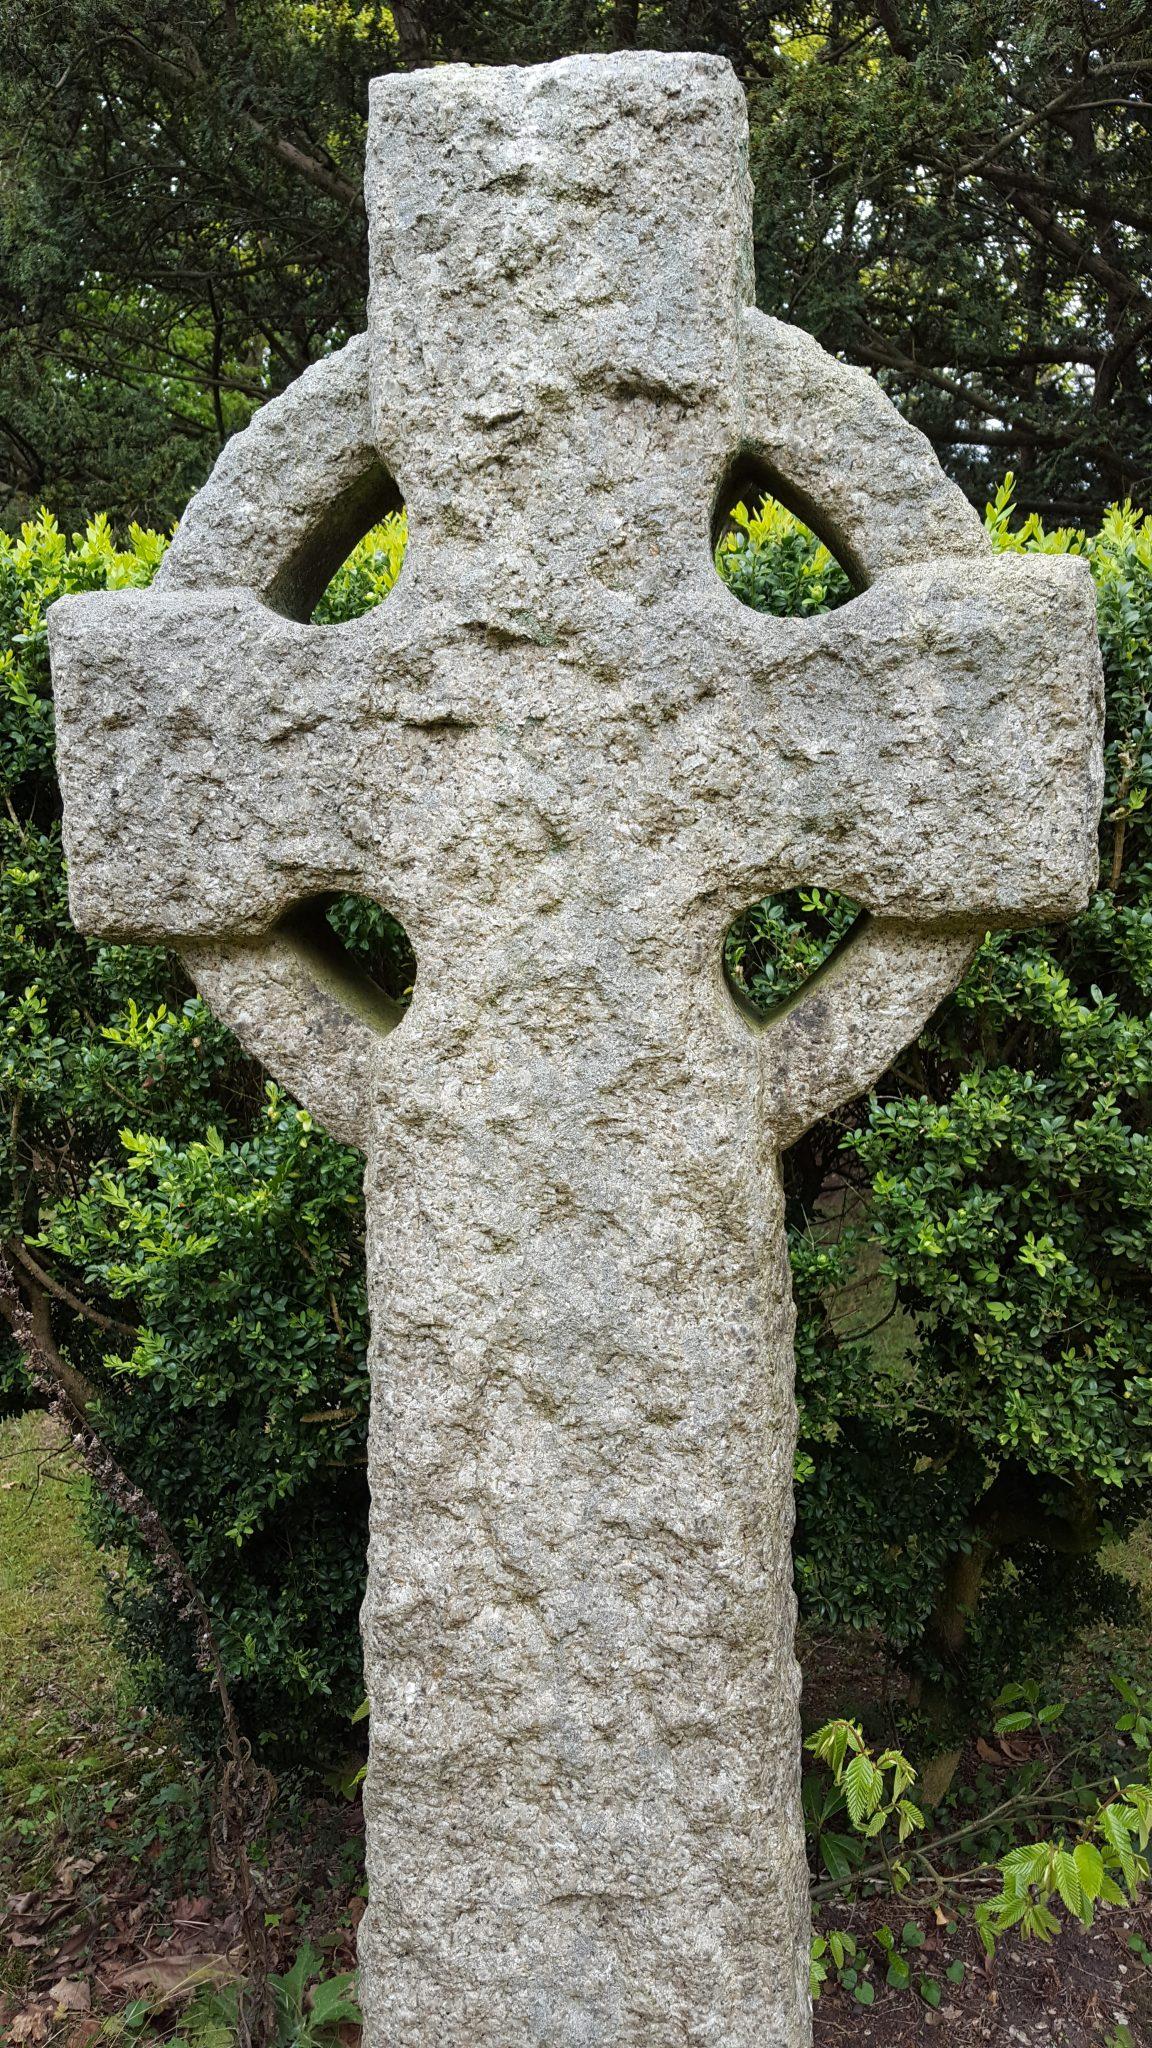 R.I.P. Father Patrick Neville mhm